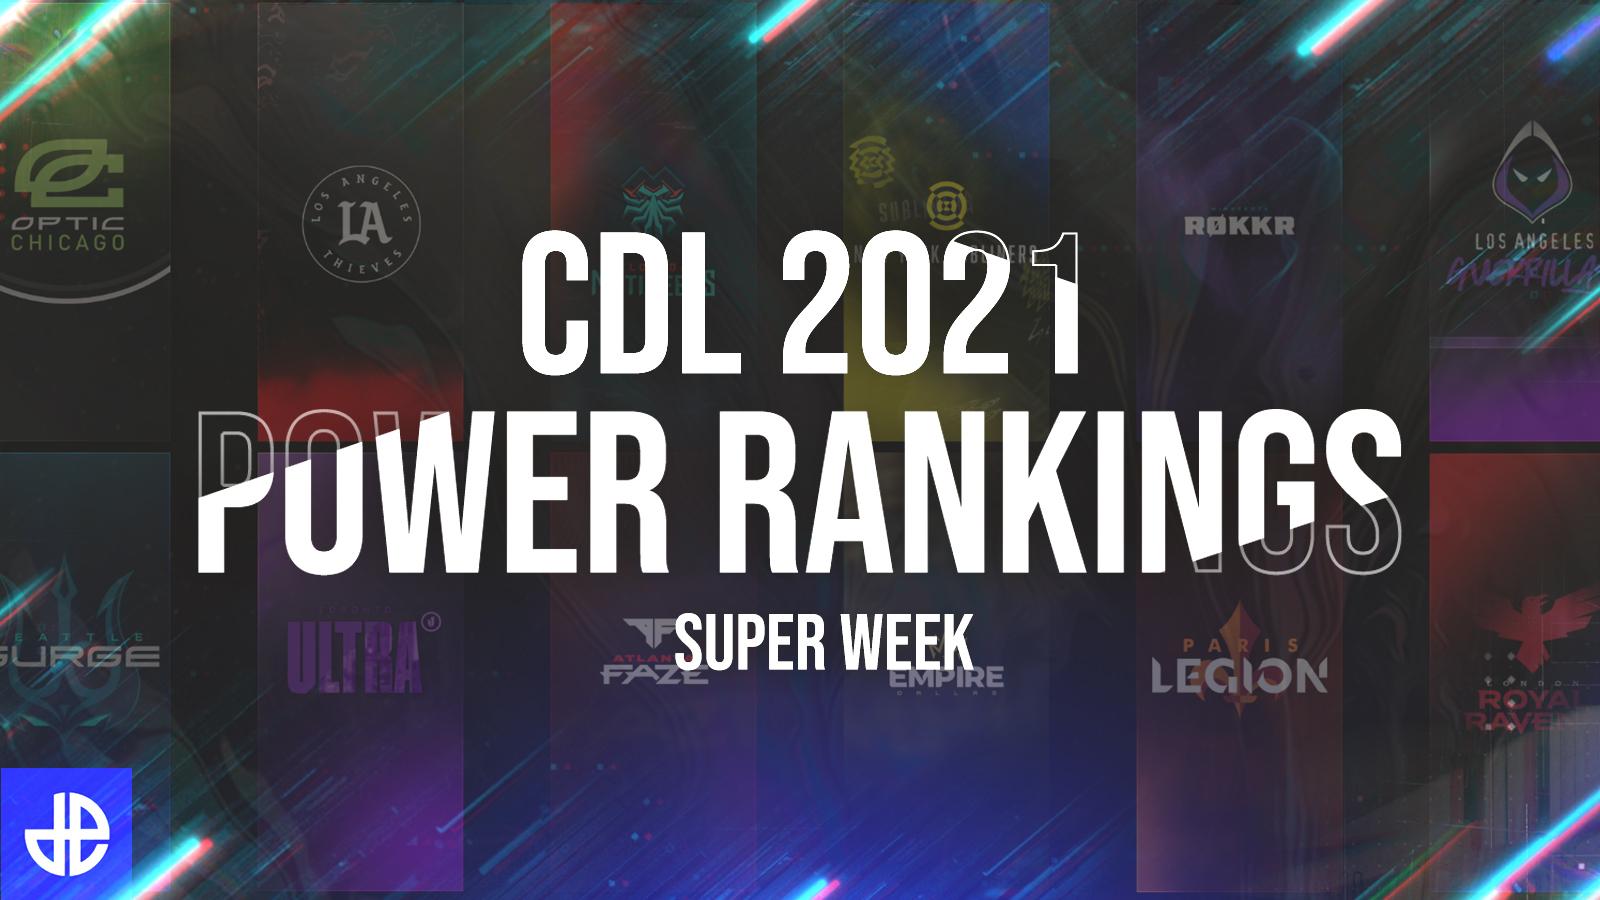 Call of Duty League CDL2021 Power Rankings